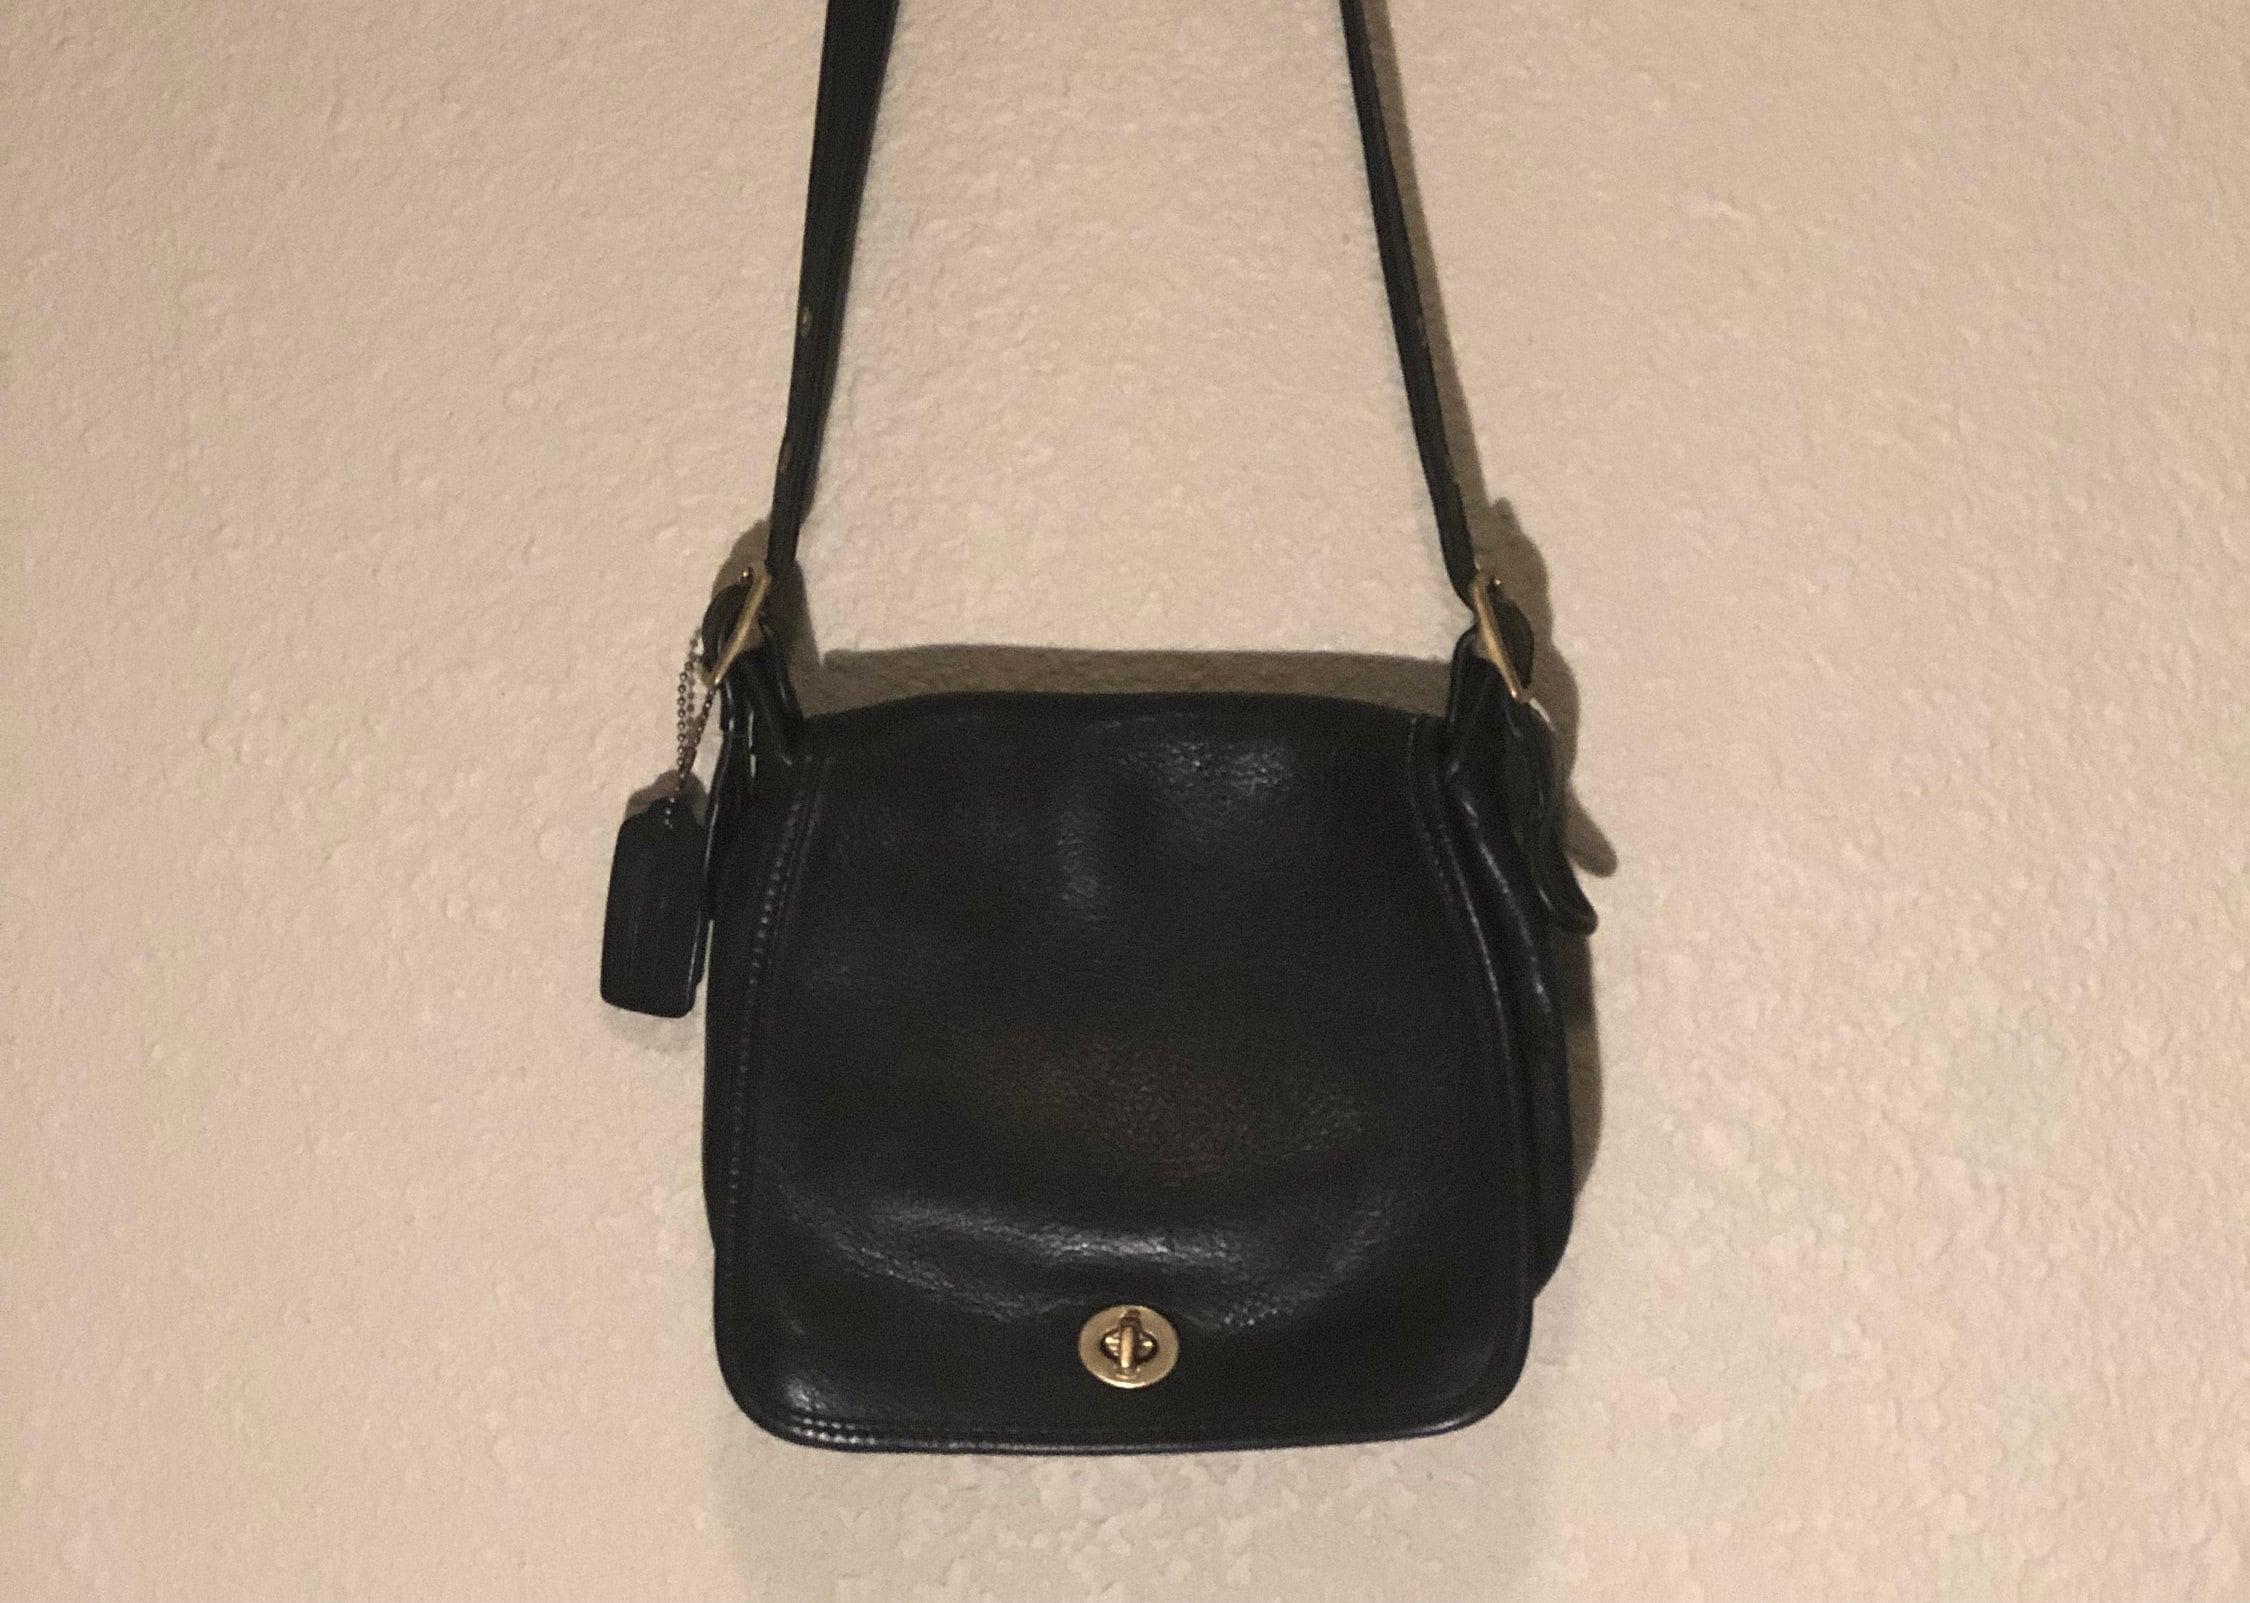 b628143c30ed Vintage Coach saddle bag